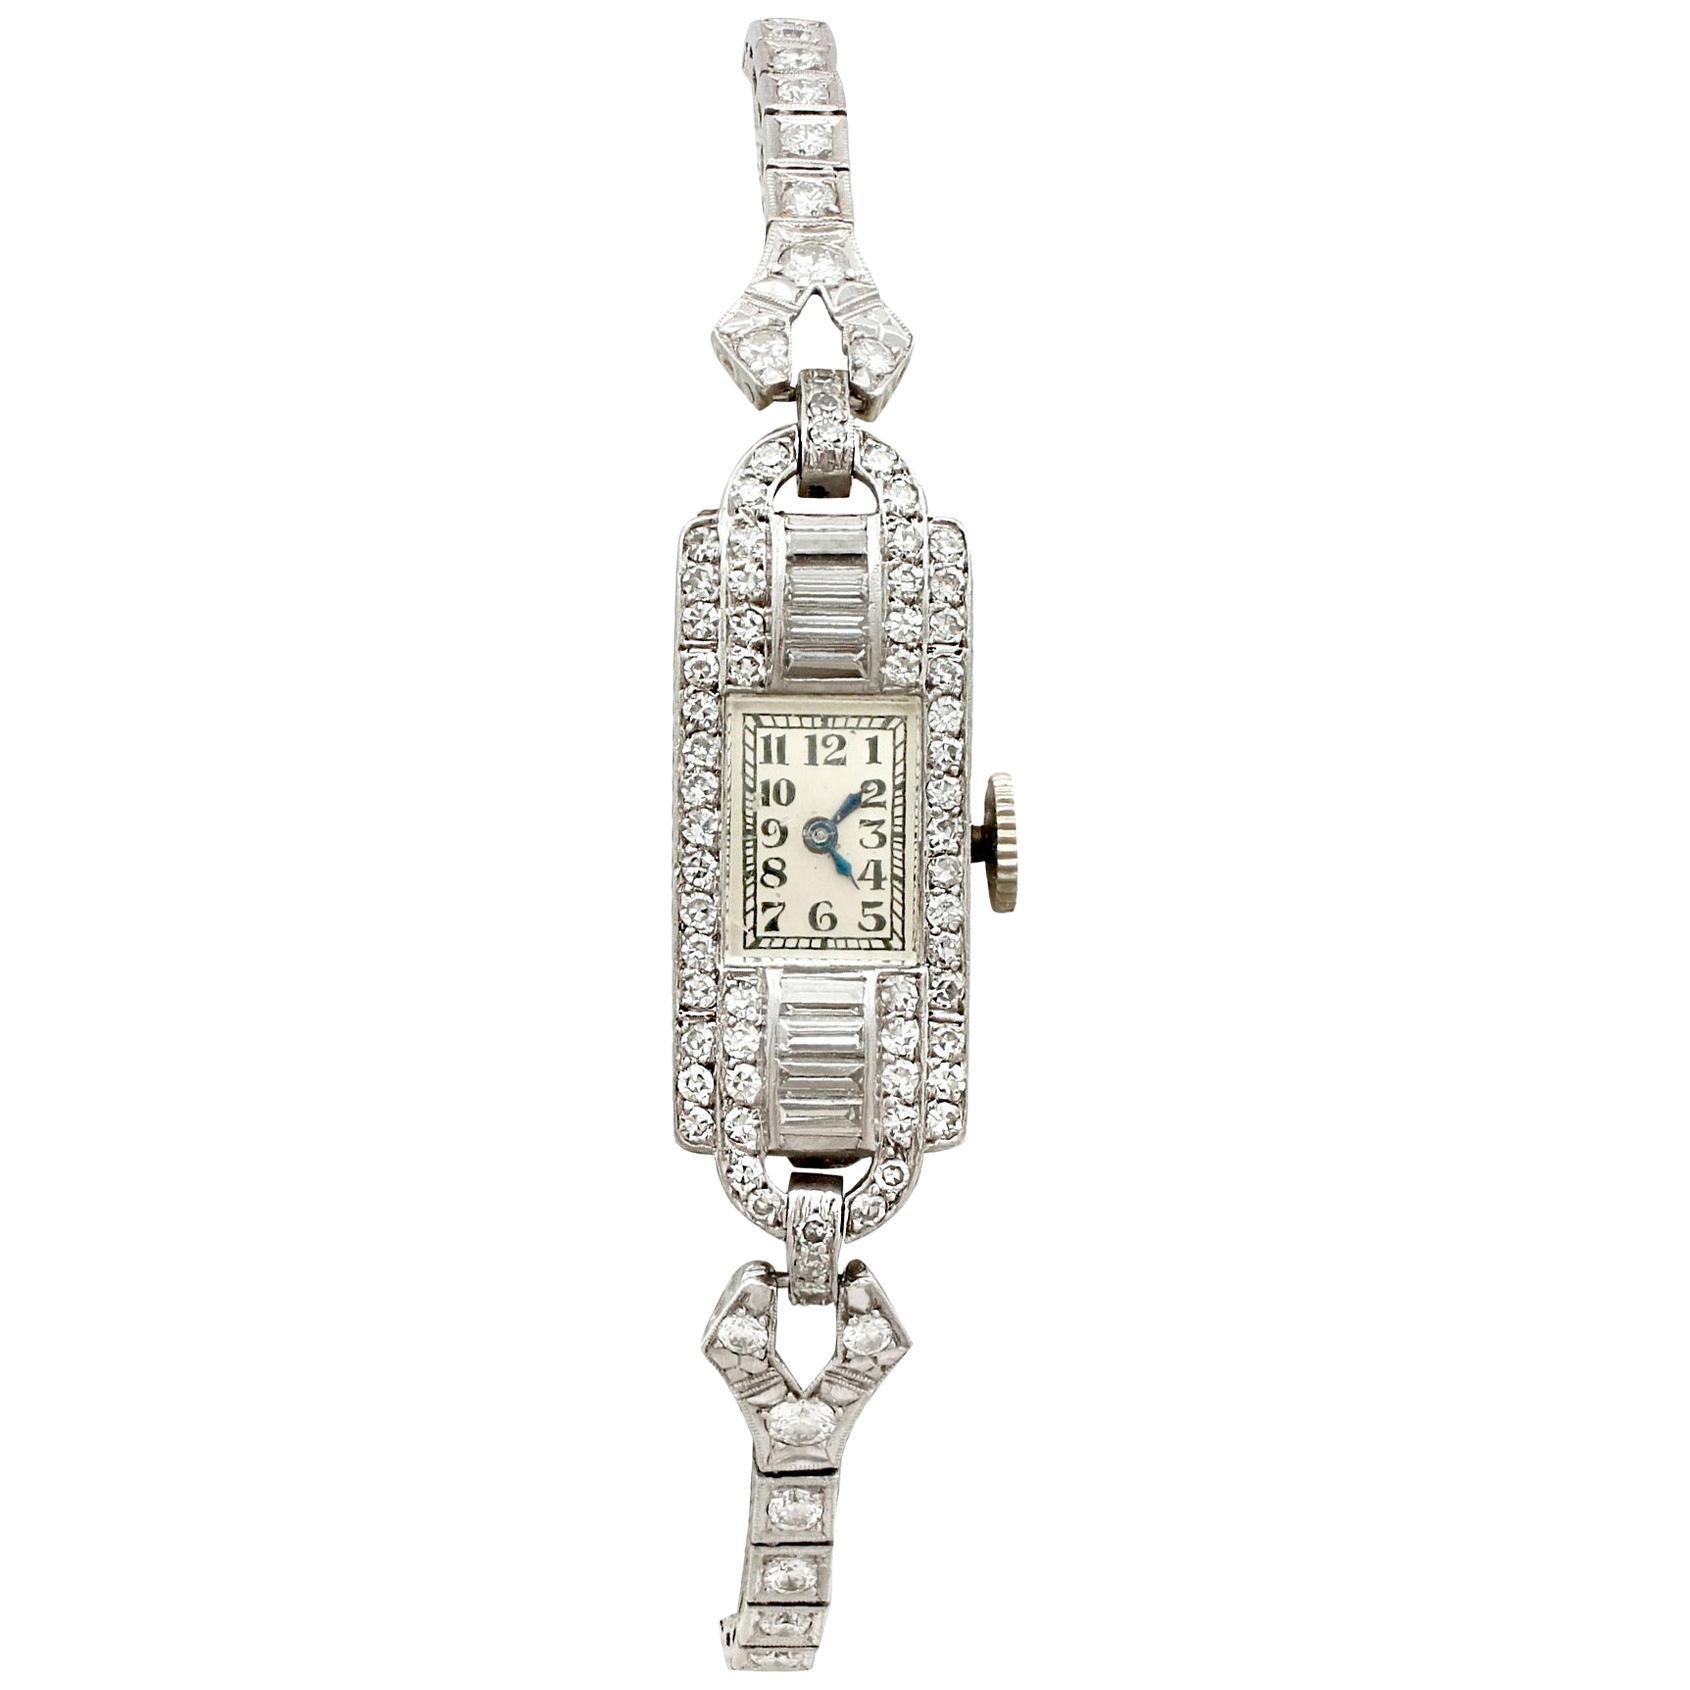 Antique Platinum Diamond Manual Wind Cocktail Wristwatch